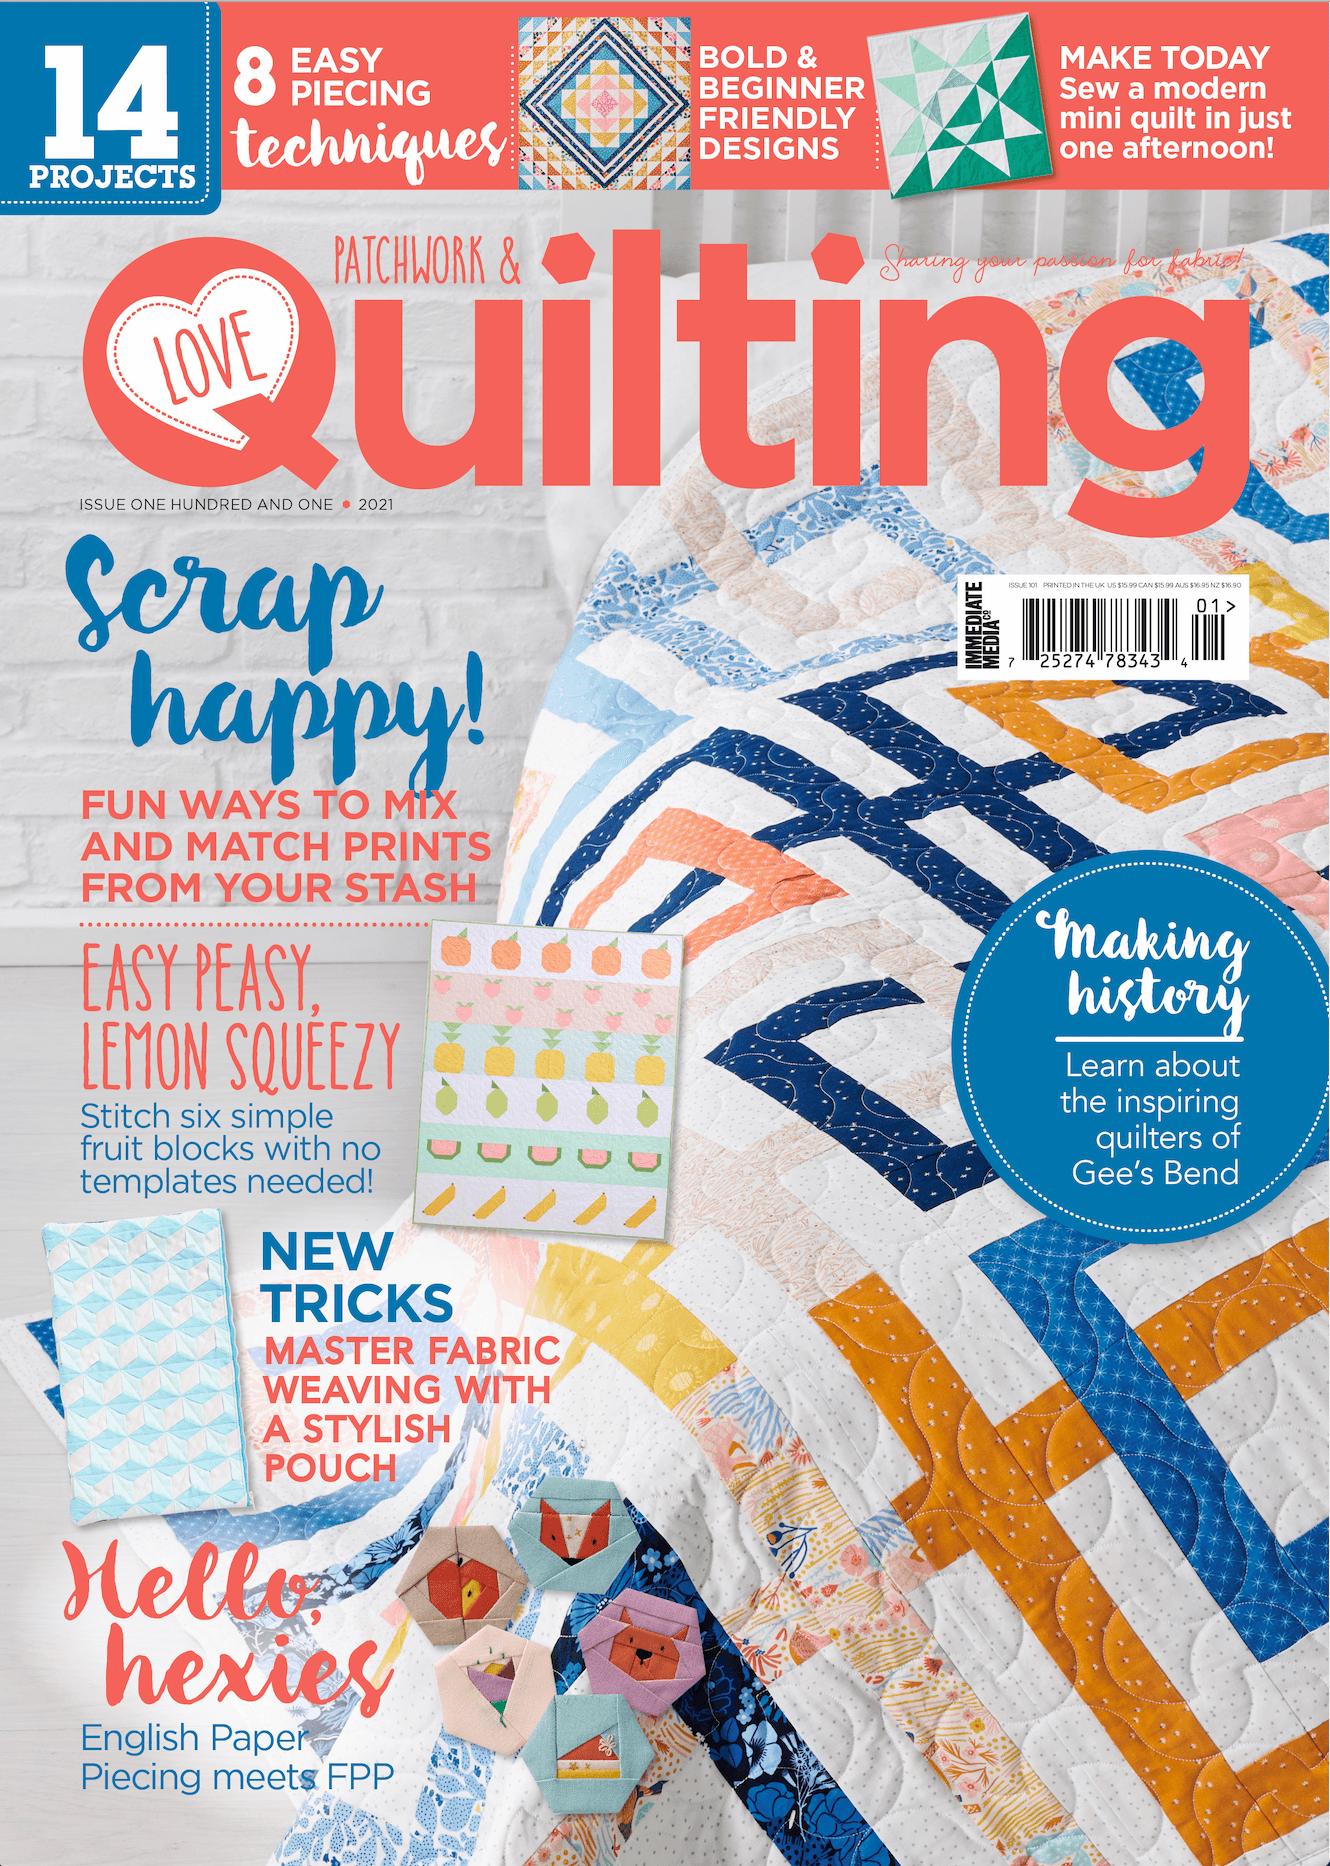 Love Patchwork & Quilting magazine issue 101